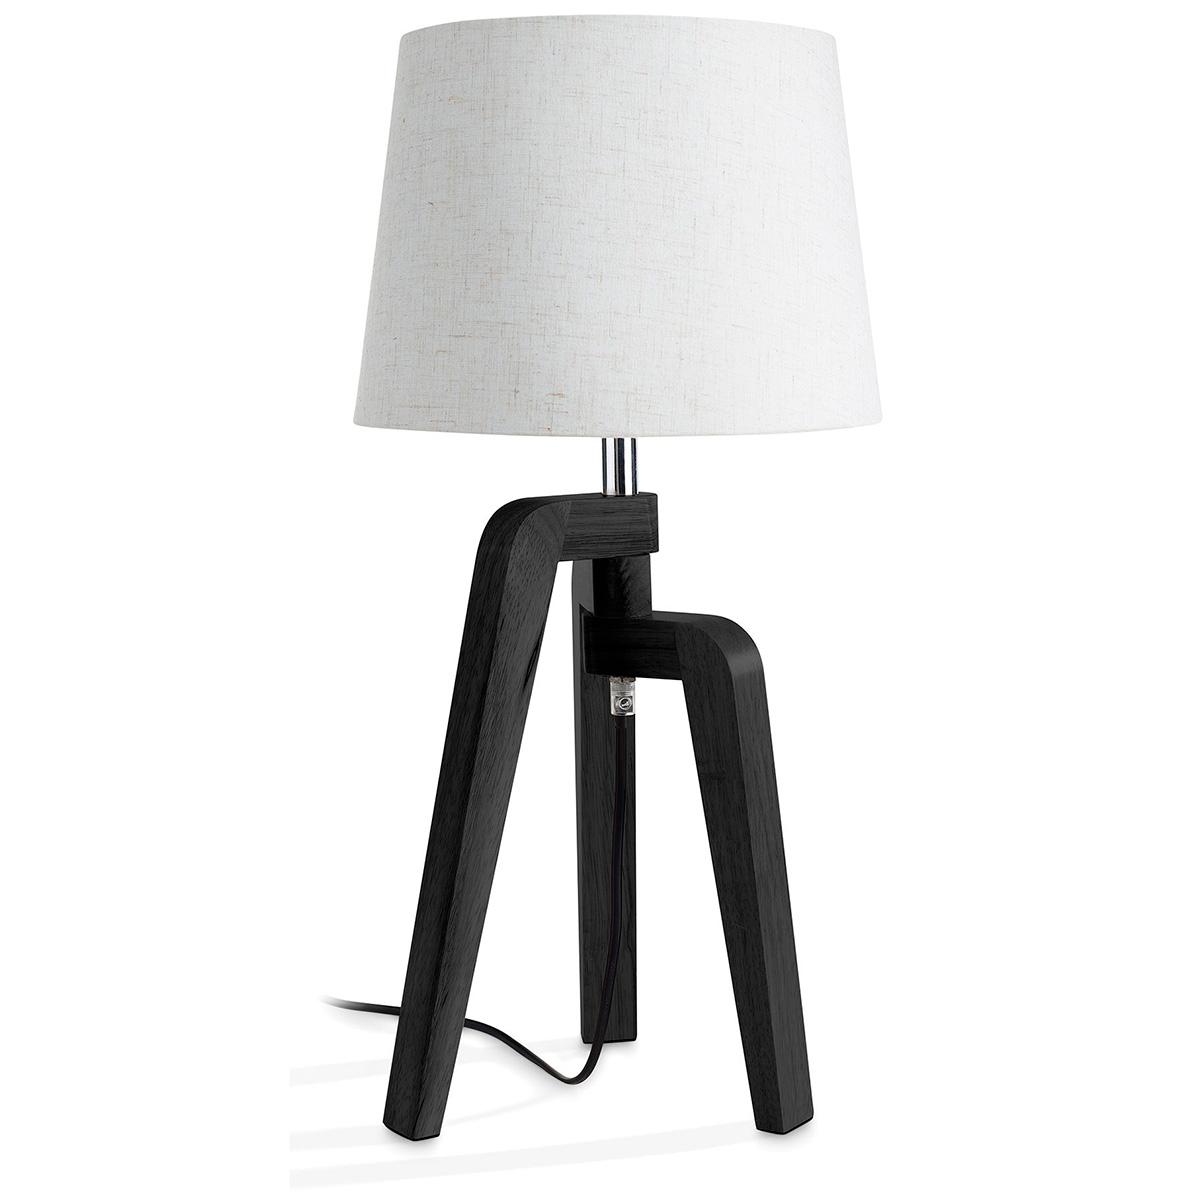 Image of   Philips myLiving bordlampe - Gilbert - Sort/hvid